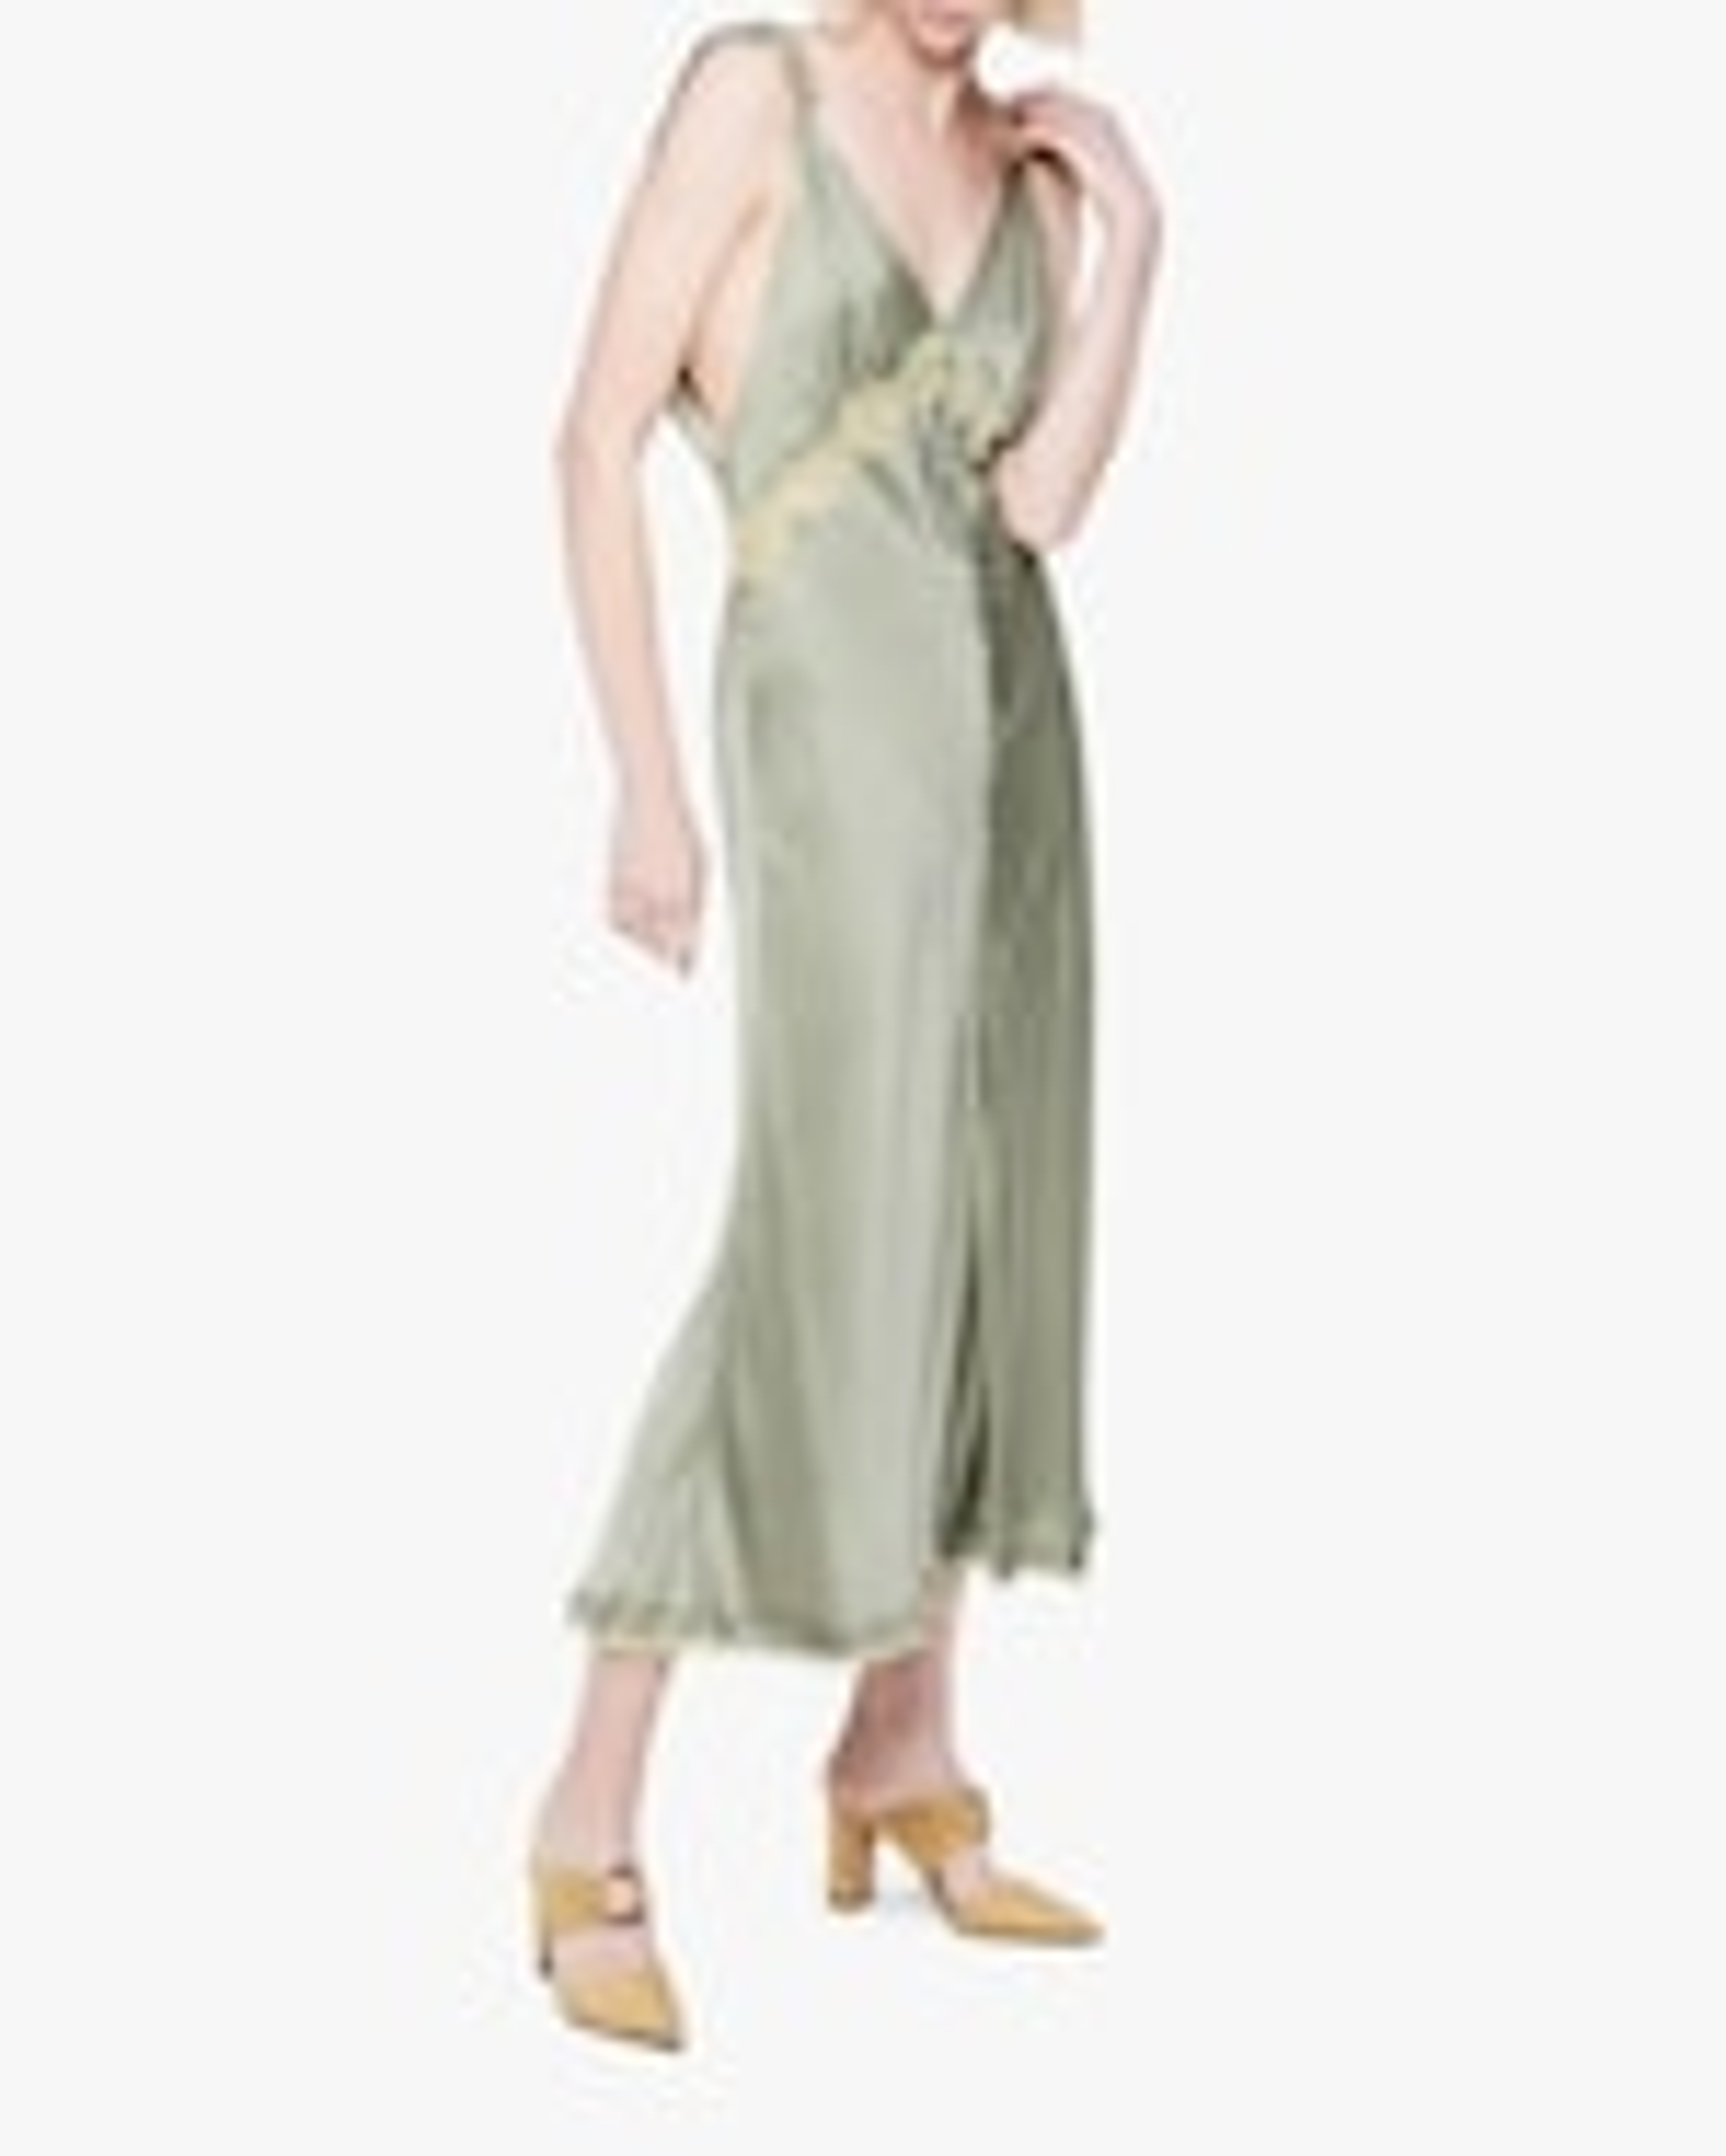 Jonathan Simkhai Kendra Sandwash Charmeuse Slip Dress 4